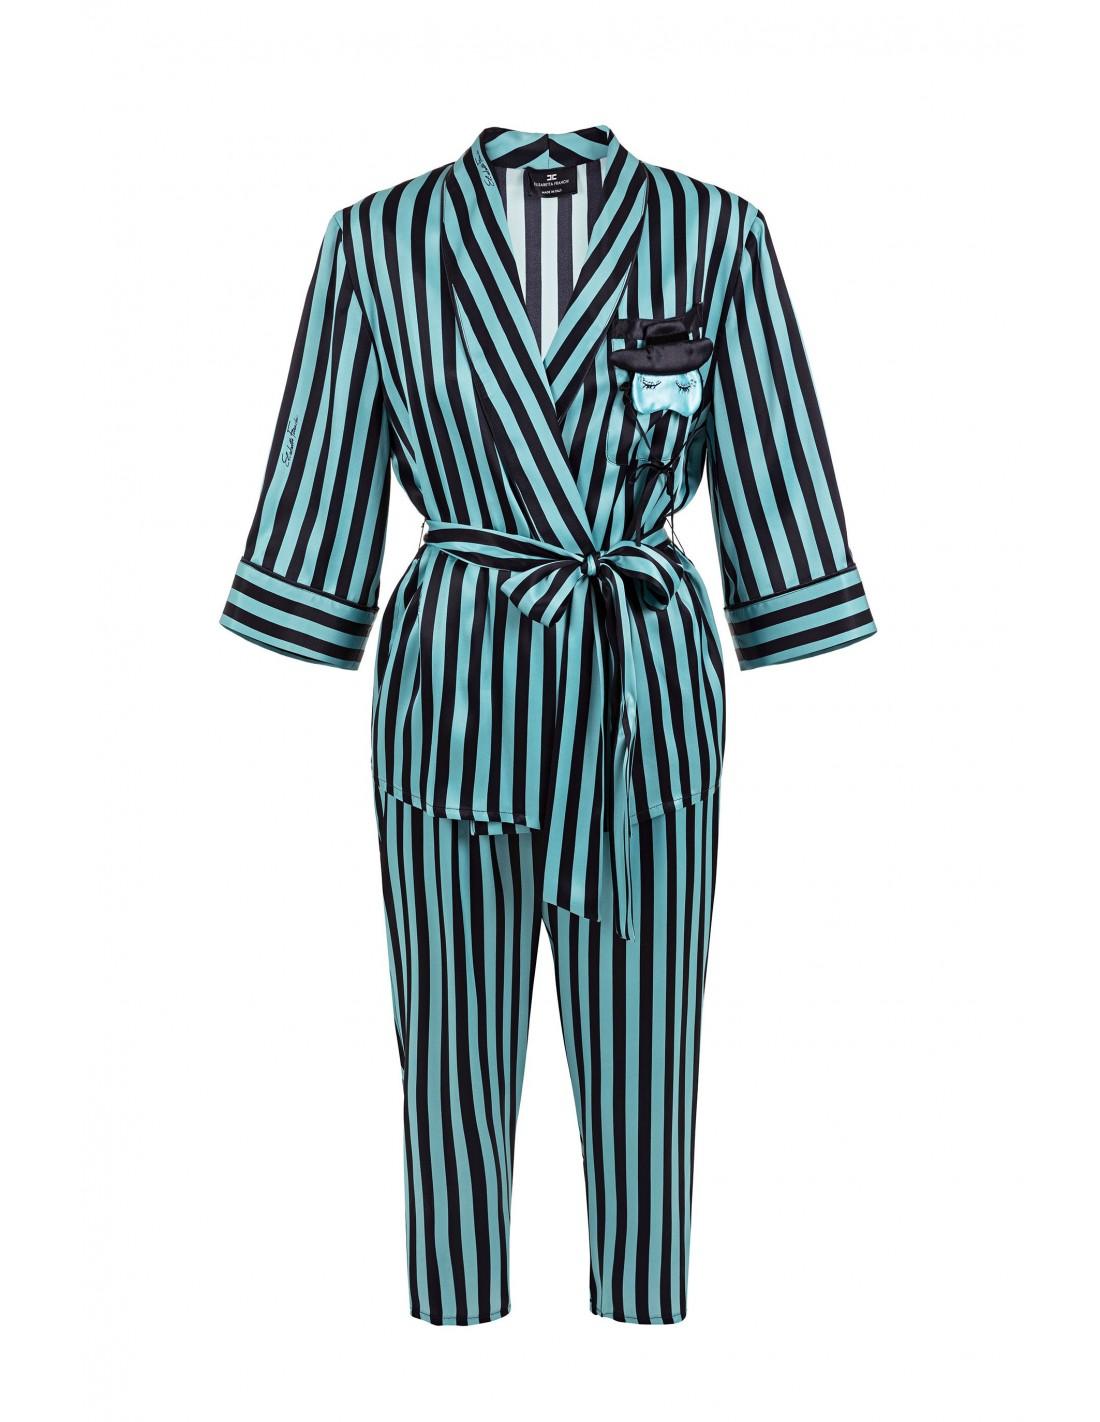 Elisabetta Franchi - Shirt blouse and pants with stripes print - photo#42